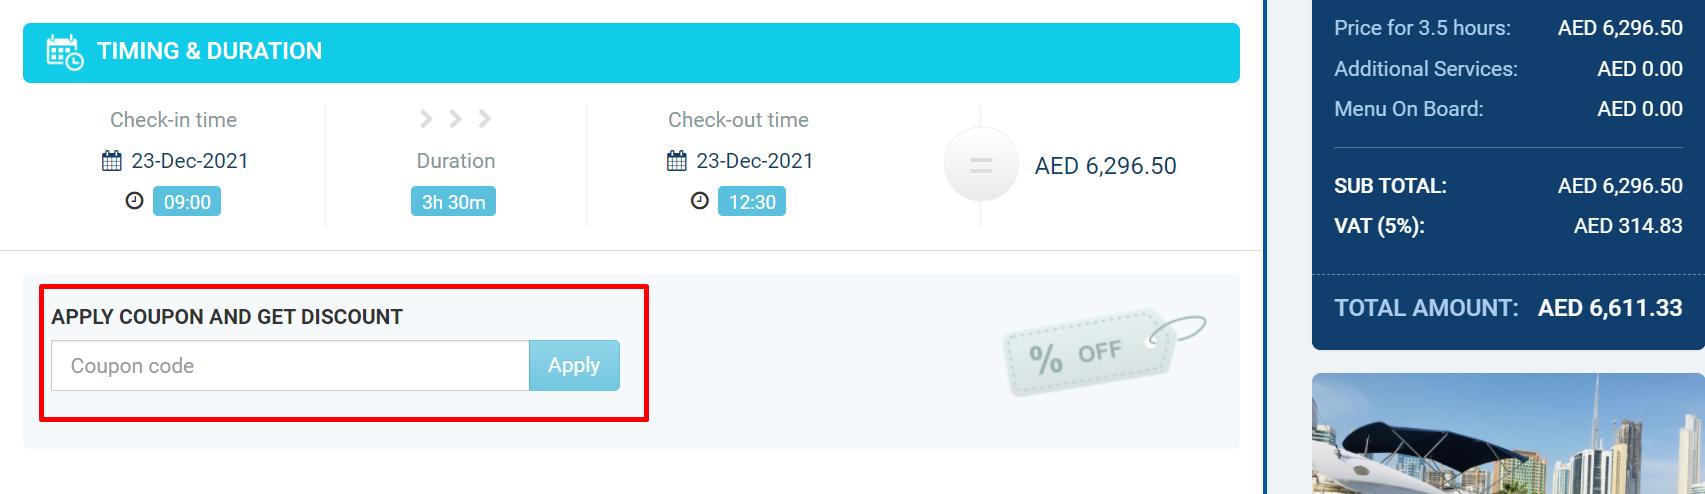 How do I use my Asfar Yacht coupon code?